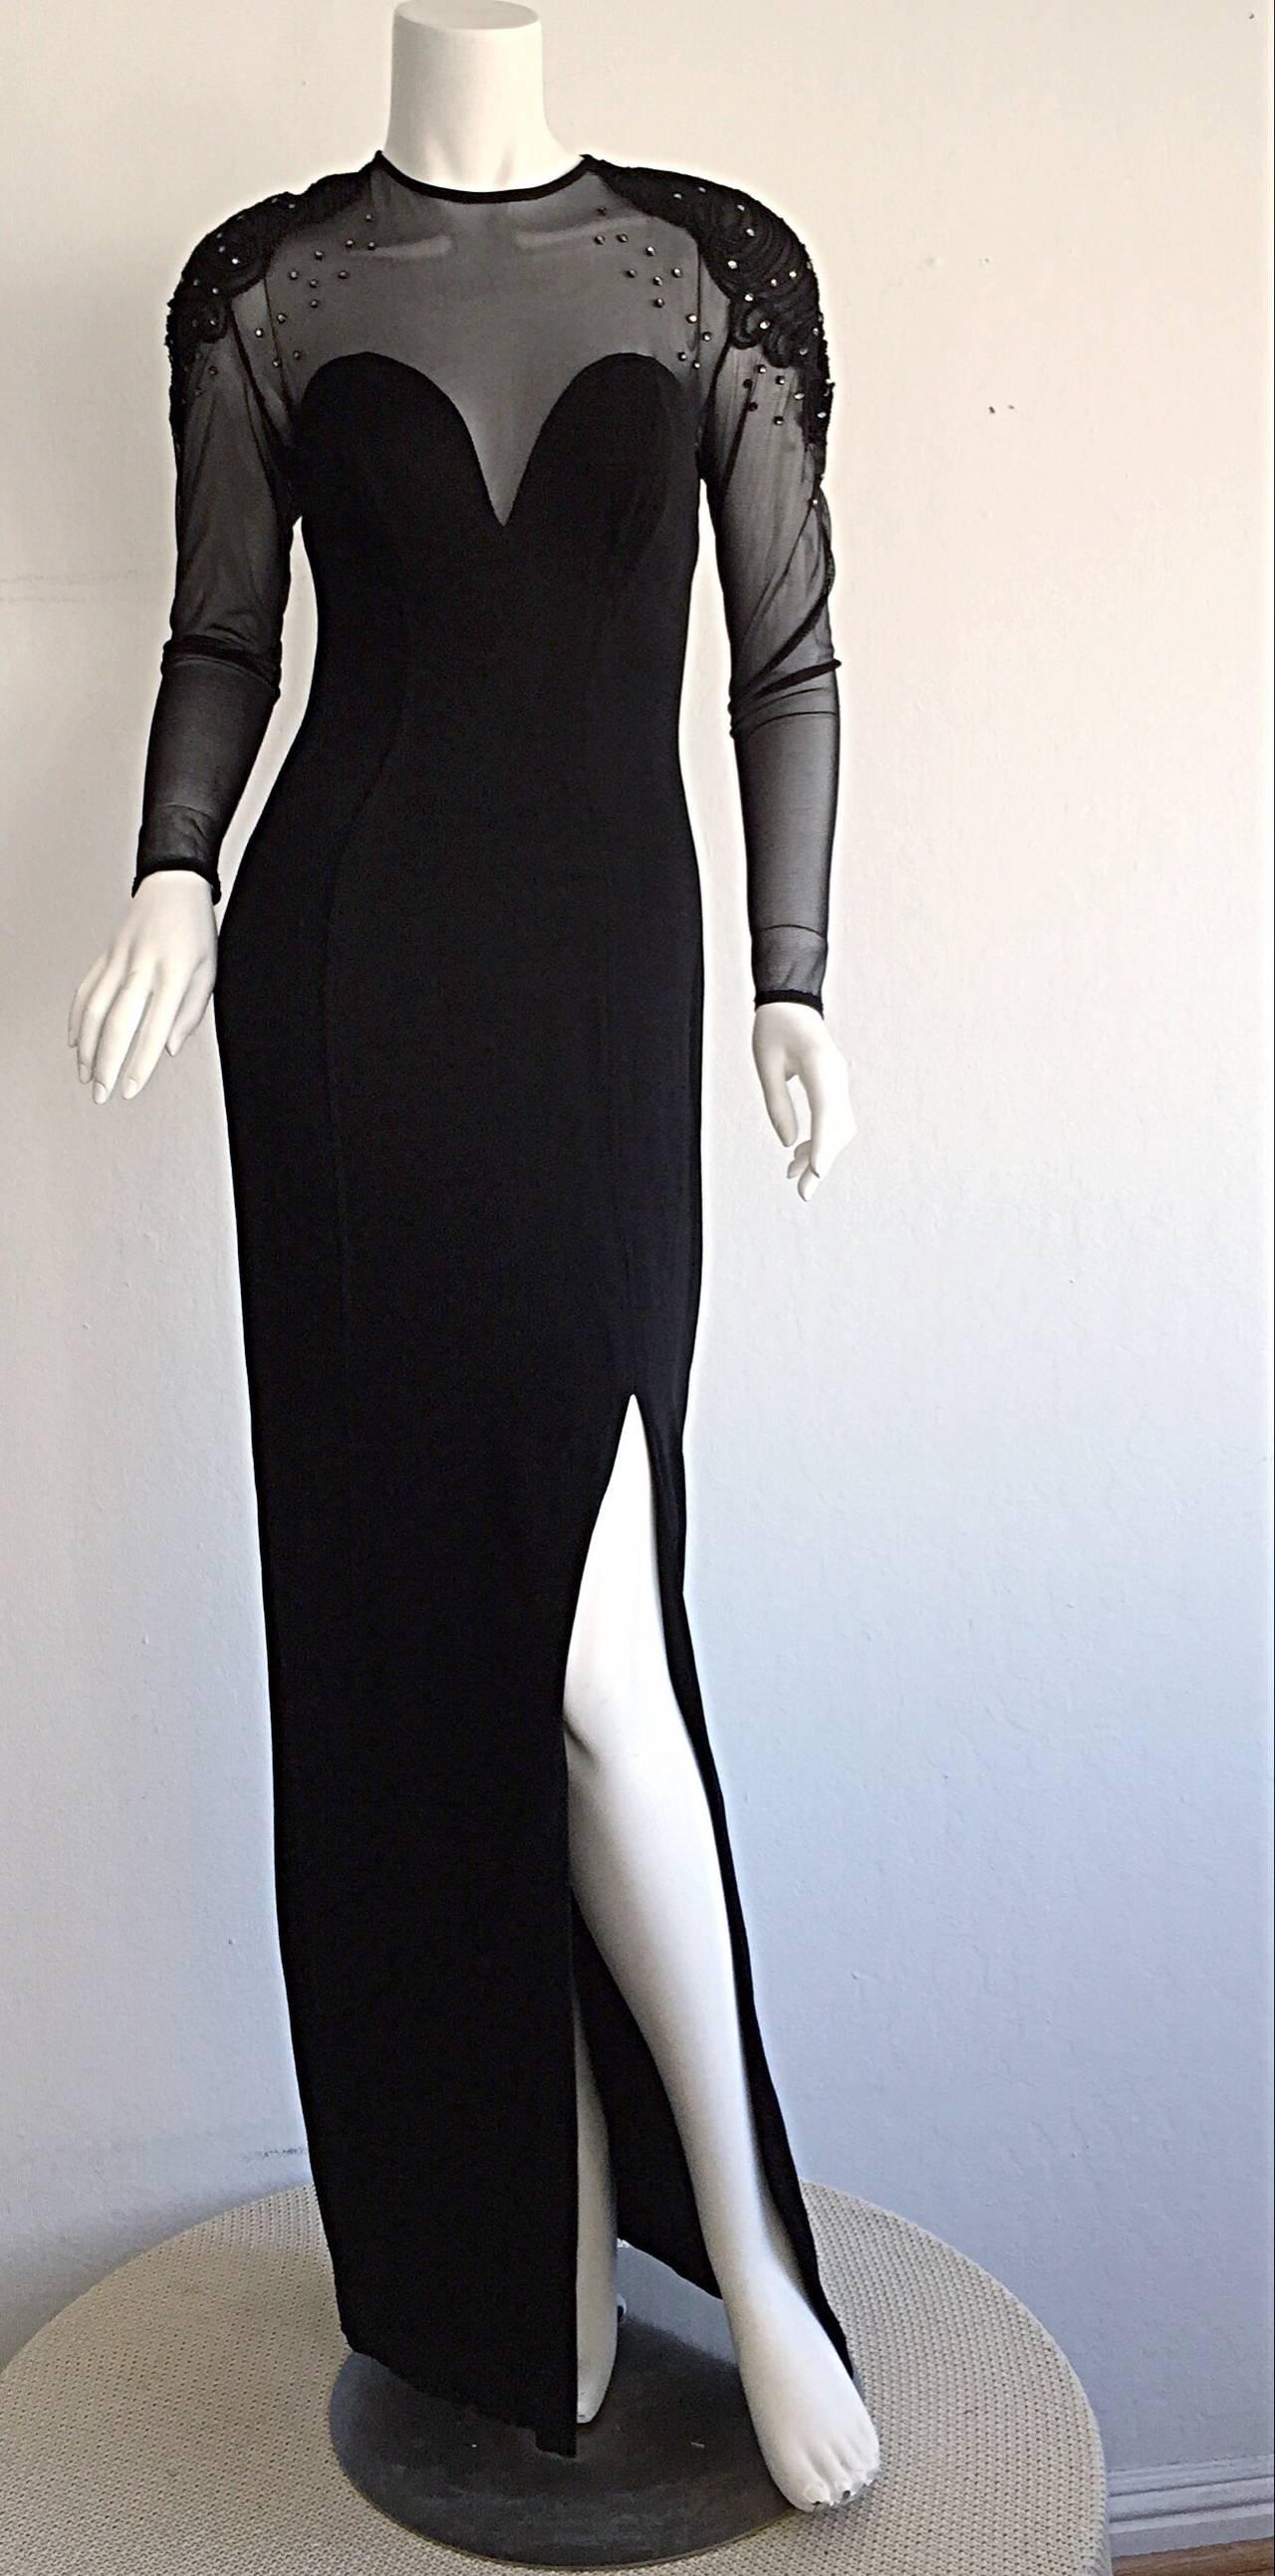 Sexy Vintage 1990s Black Cut - Out Bodycon Dress w/ Rhinestones 2